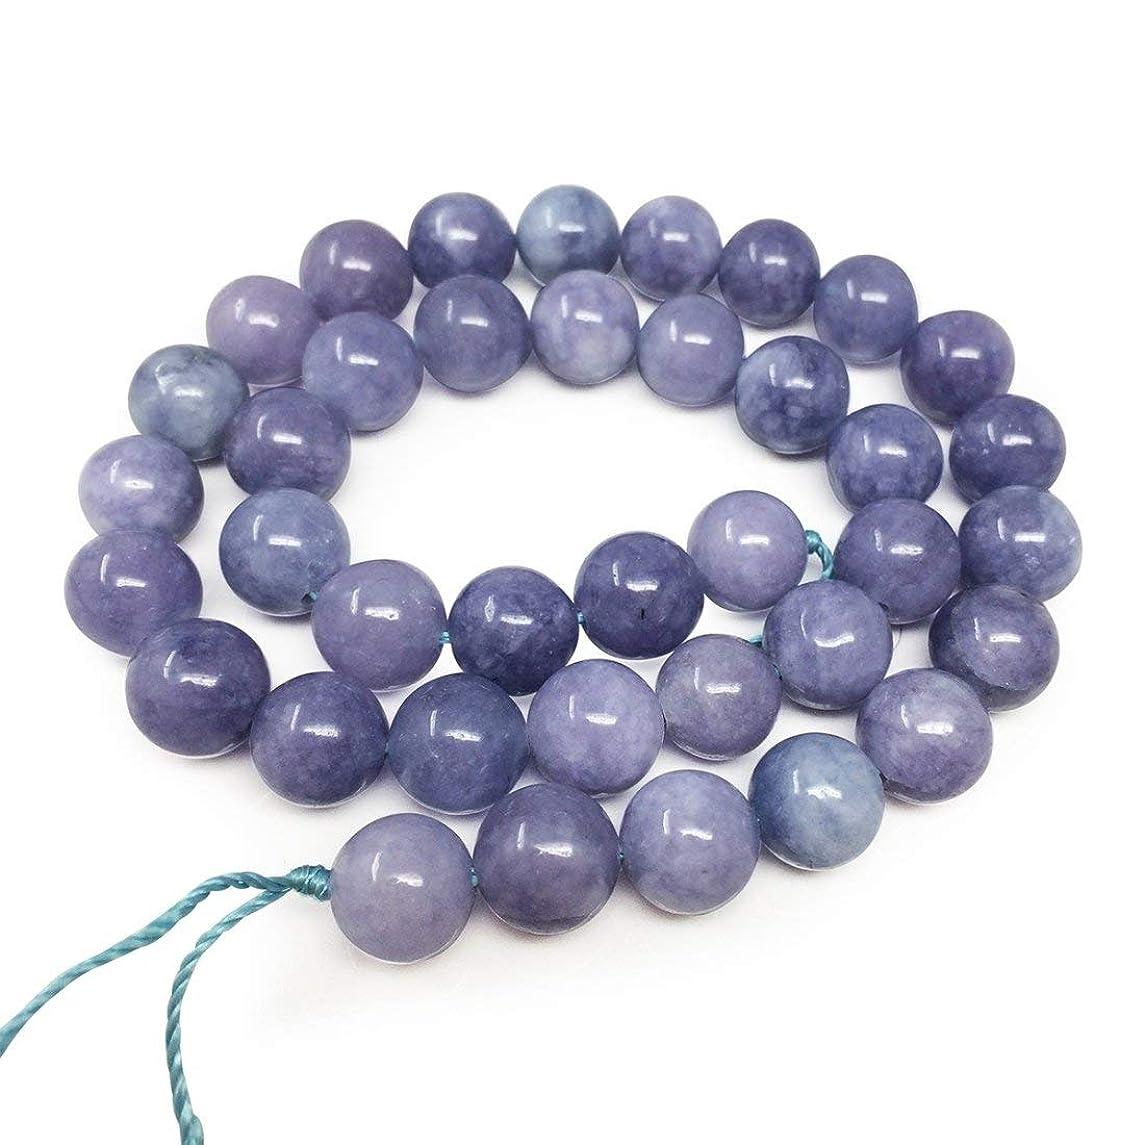 2 Strands Natural Dark Blue Aquamarine Gemstone 4mm Round Loose Stone Beads 15.5